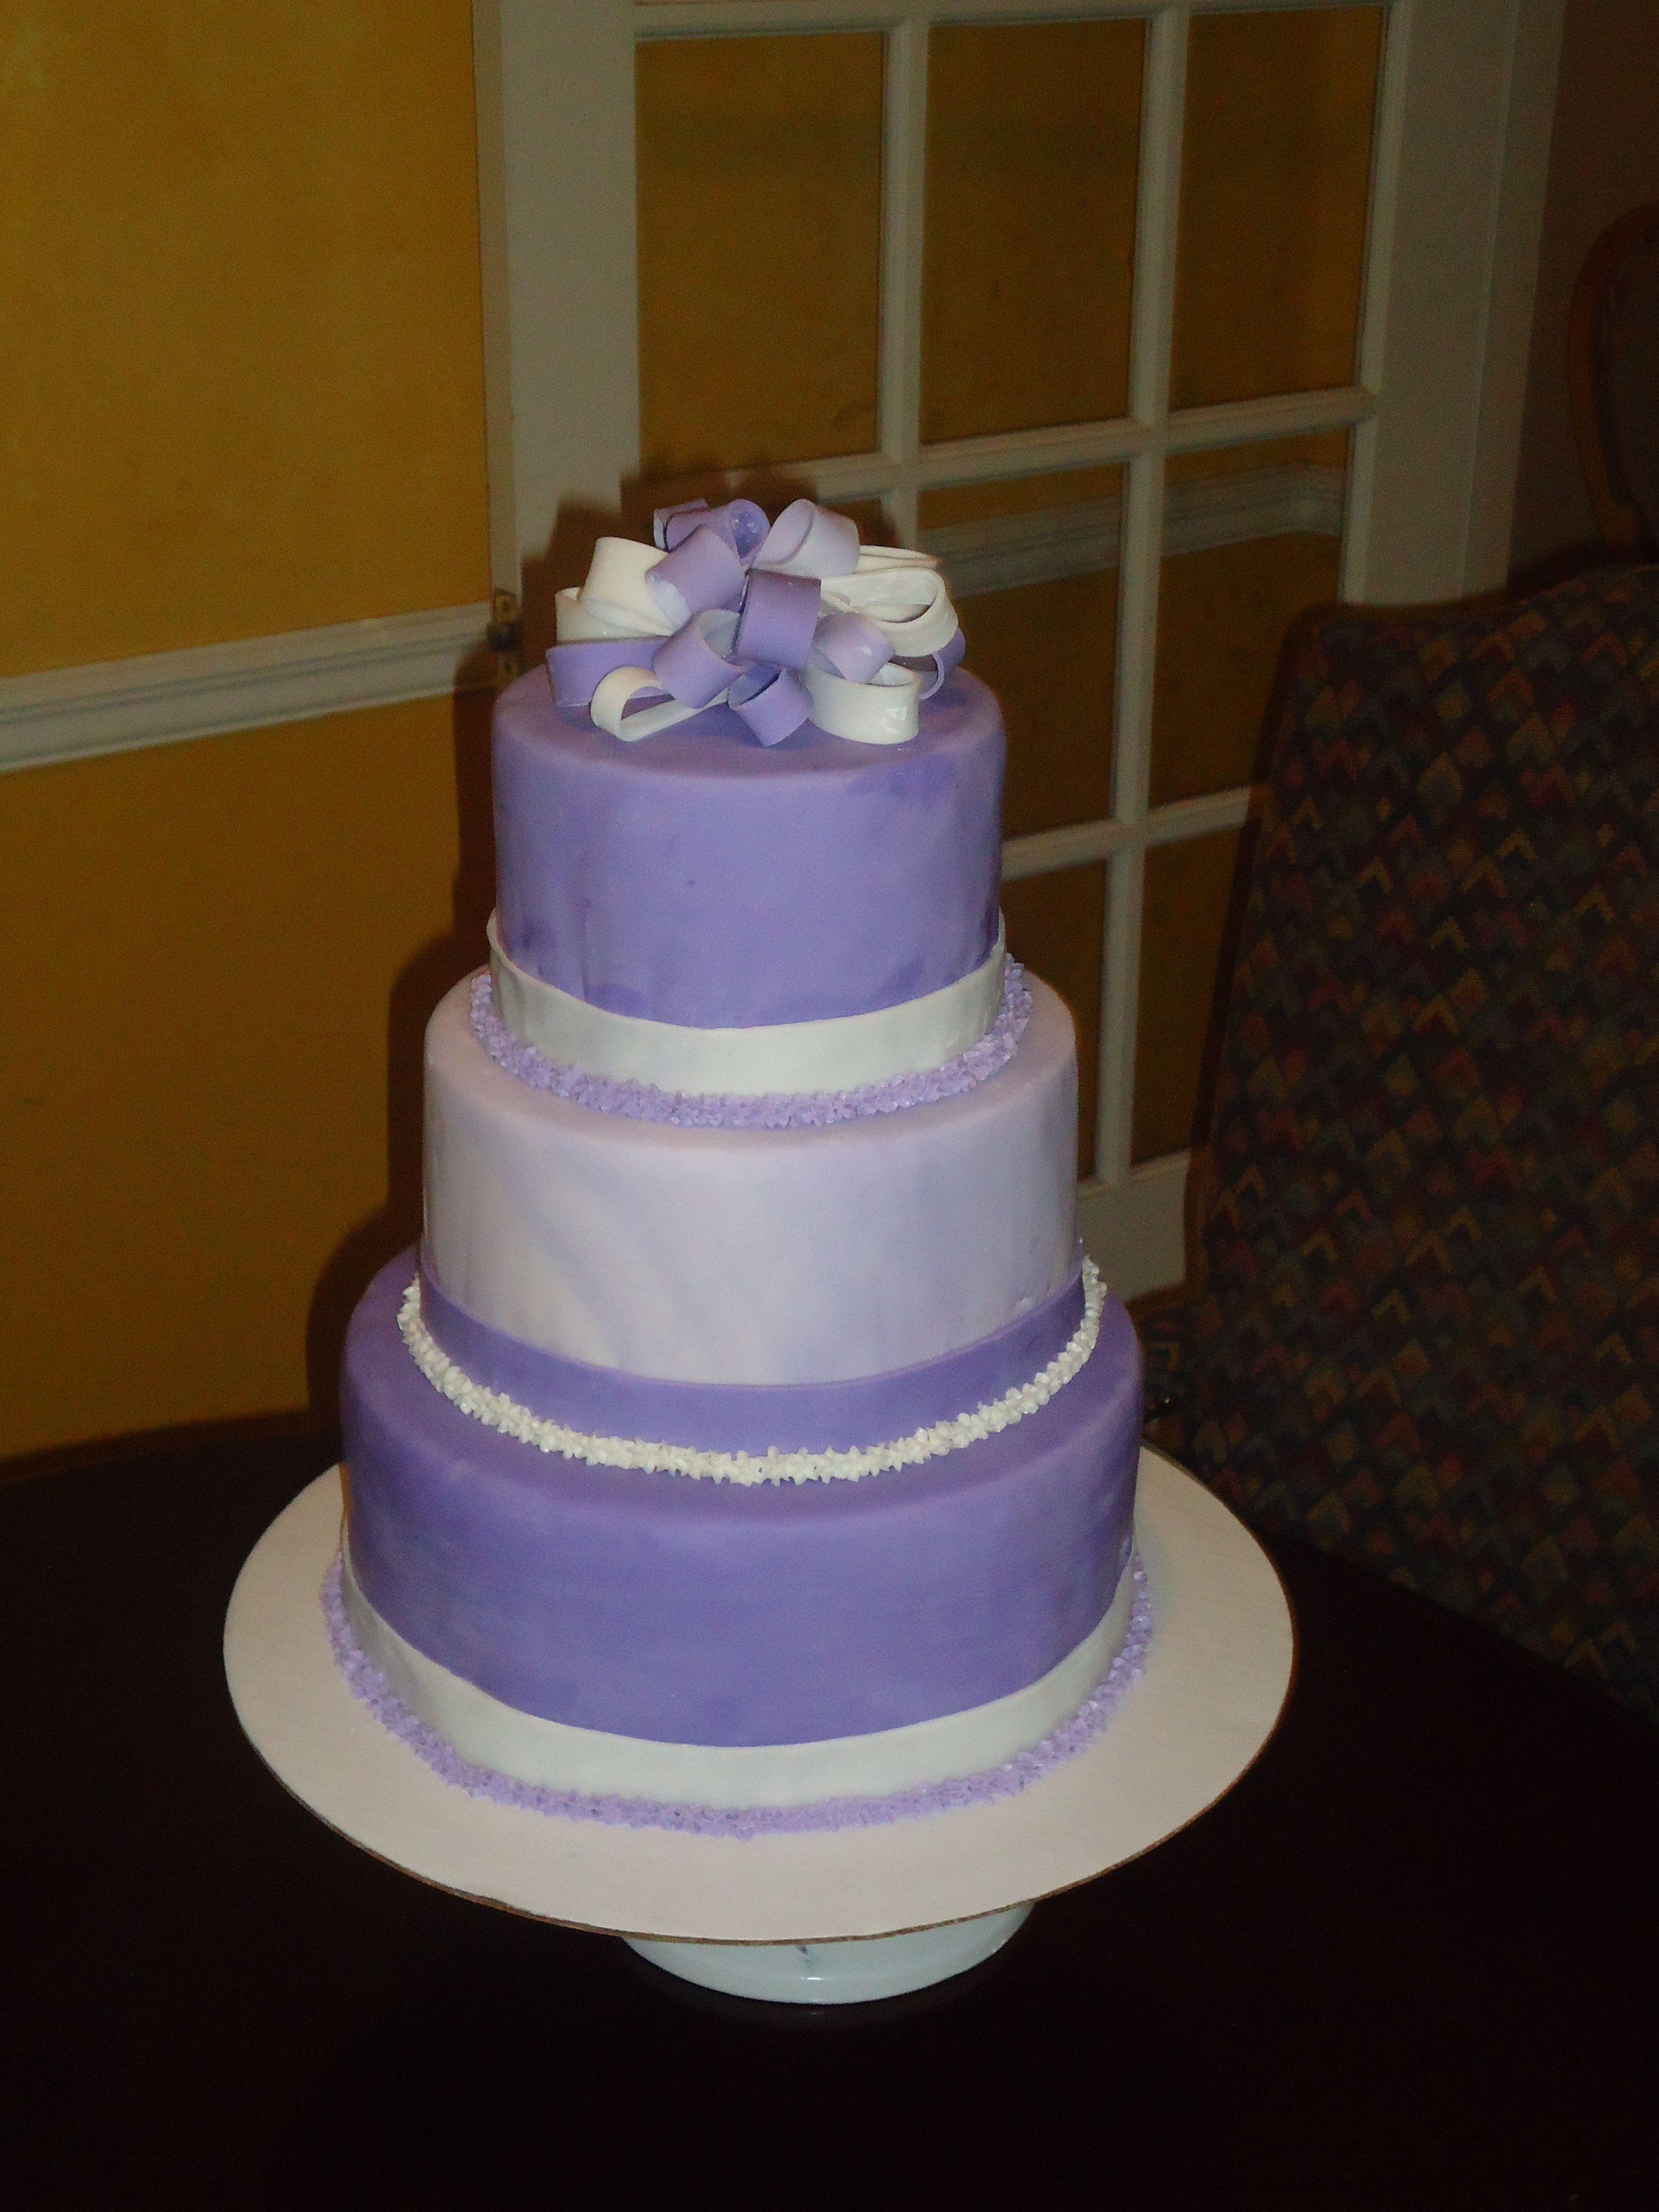 February Birthday Cakes February Birthday Cake 2 12 Deen Of Cakes Pinterest